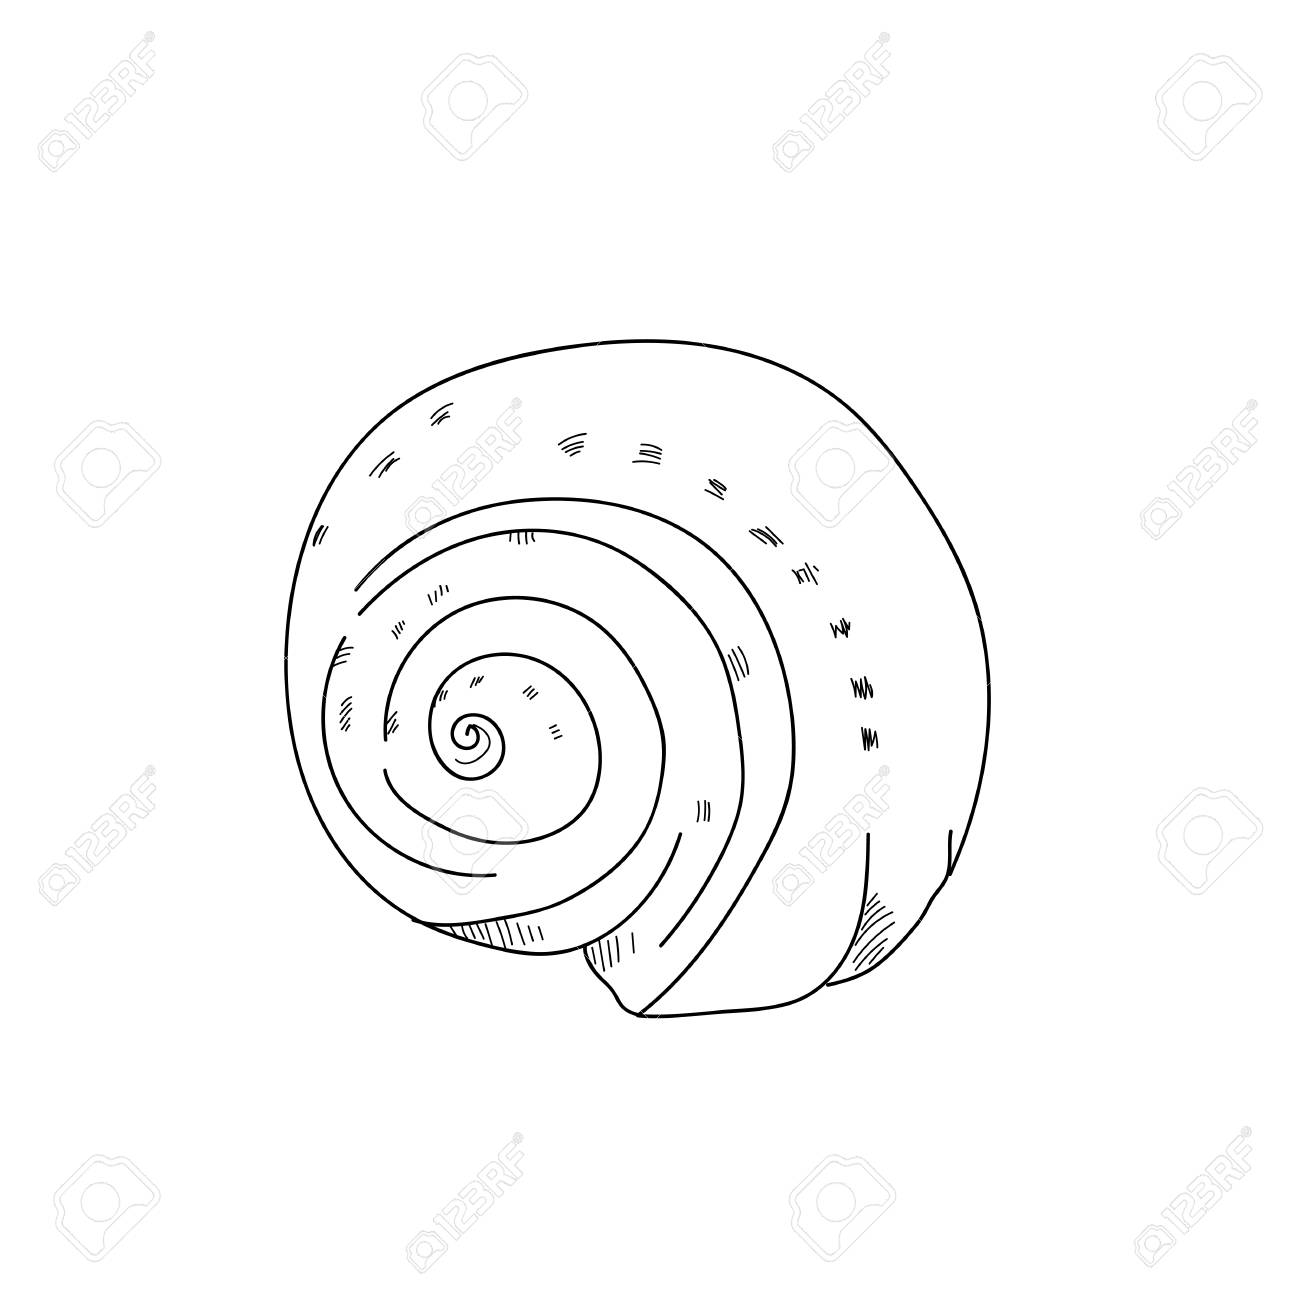 1300x1299 Shellfish Drawing.black And White Line Sketching Illustration